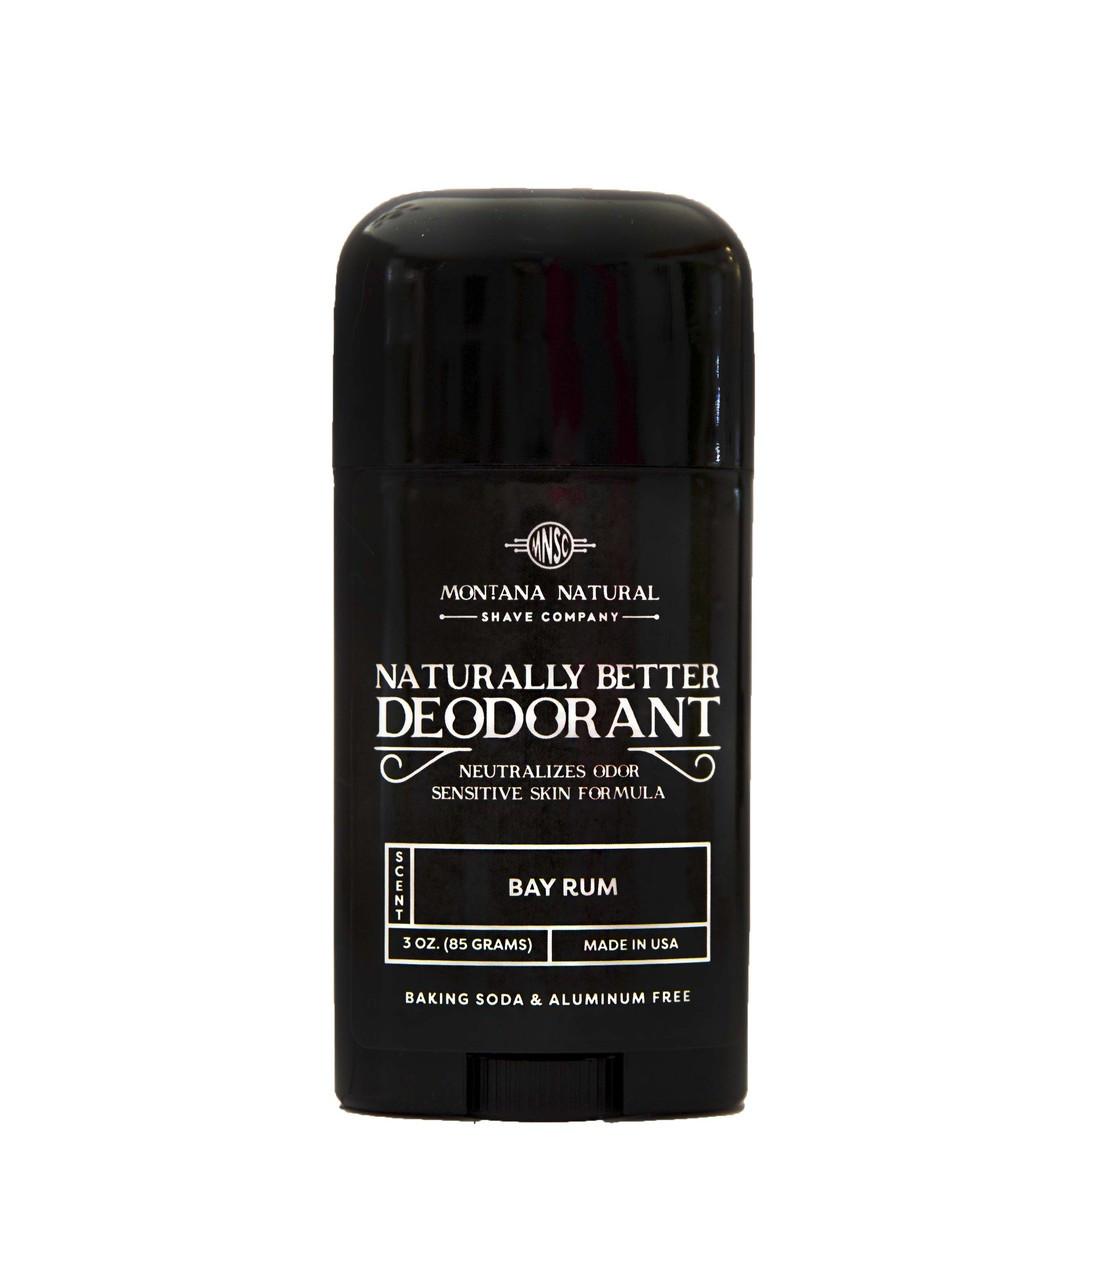 All Bay Rum Stick | Sensitive Skin Formula | Baking Soda Free | Aluminum Free